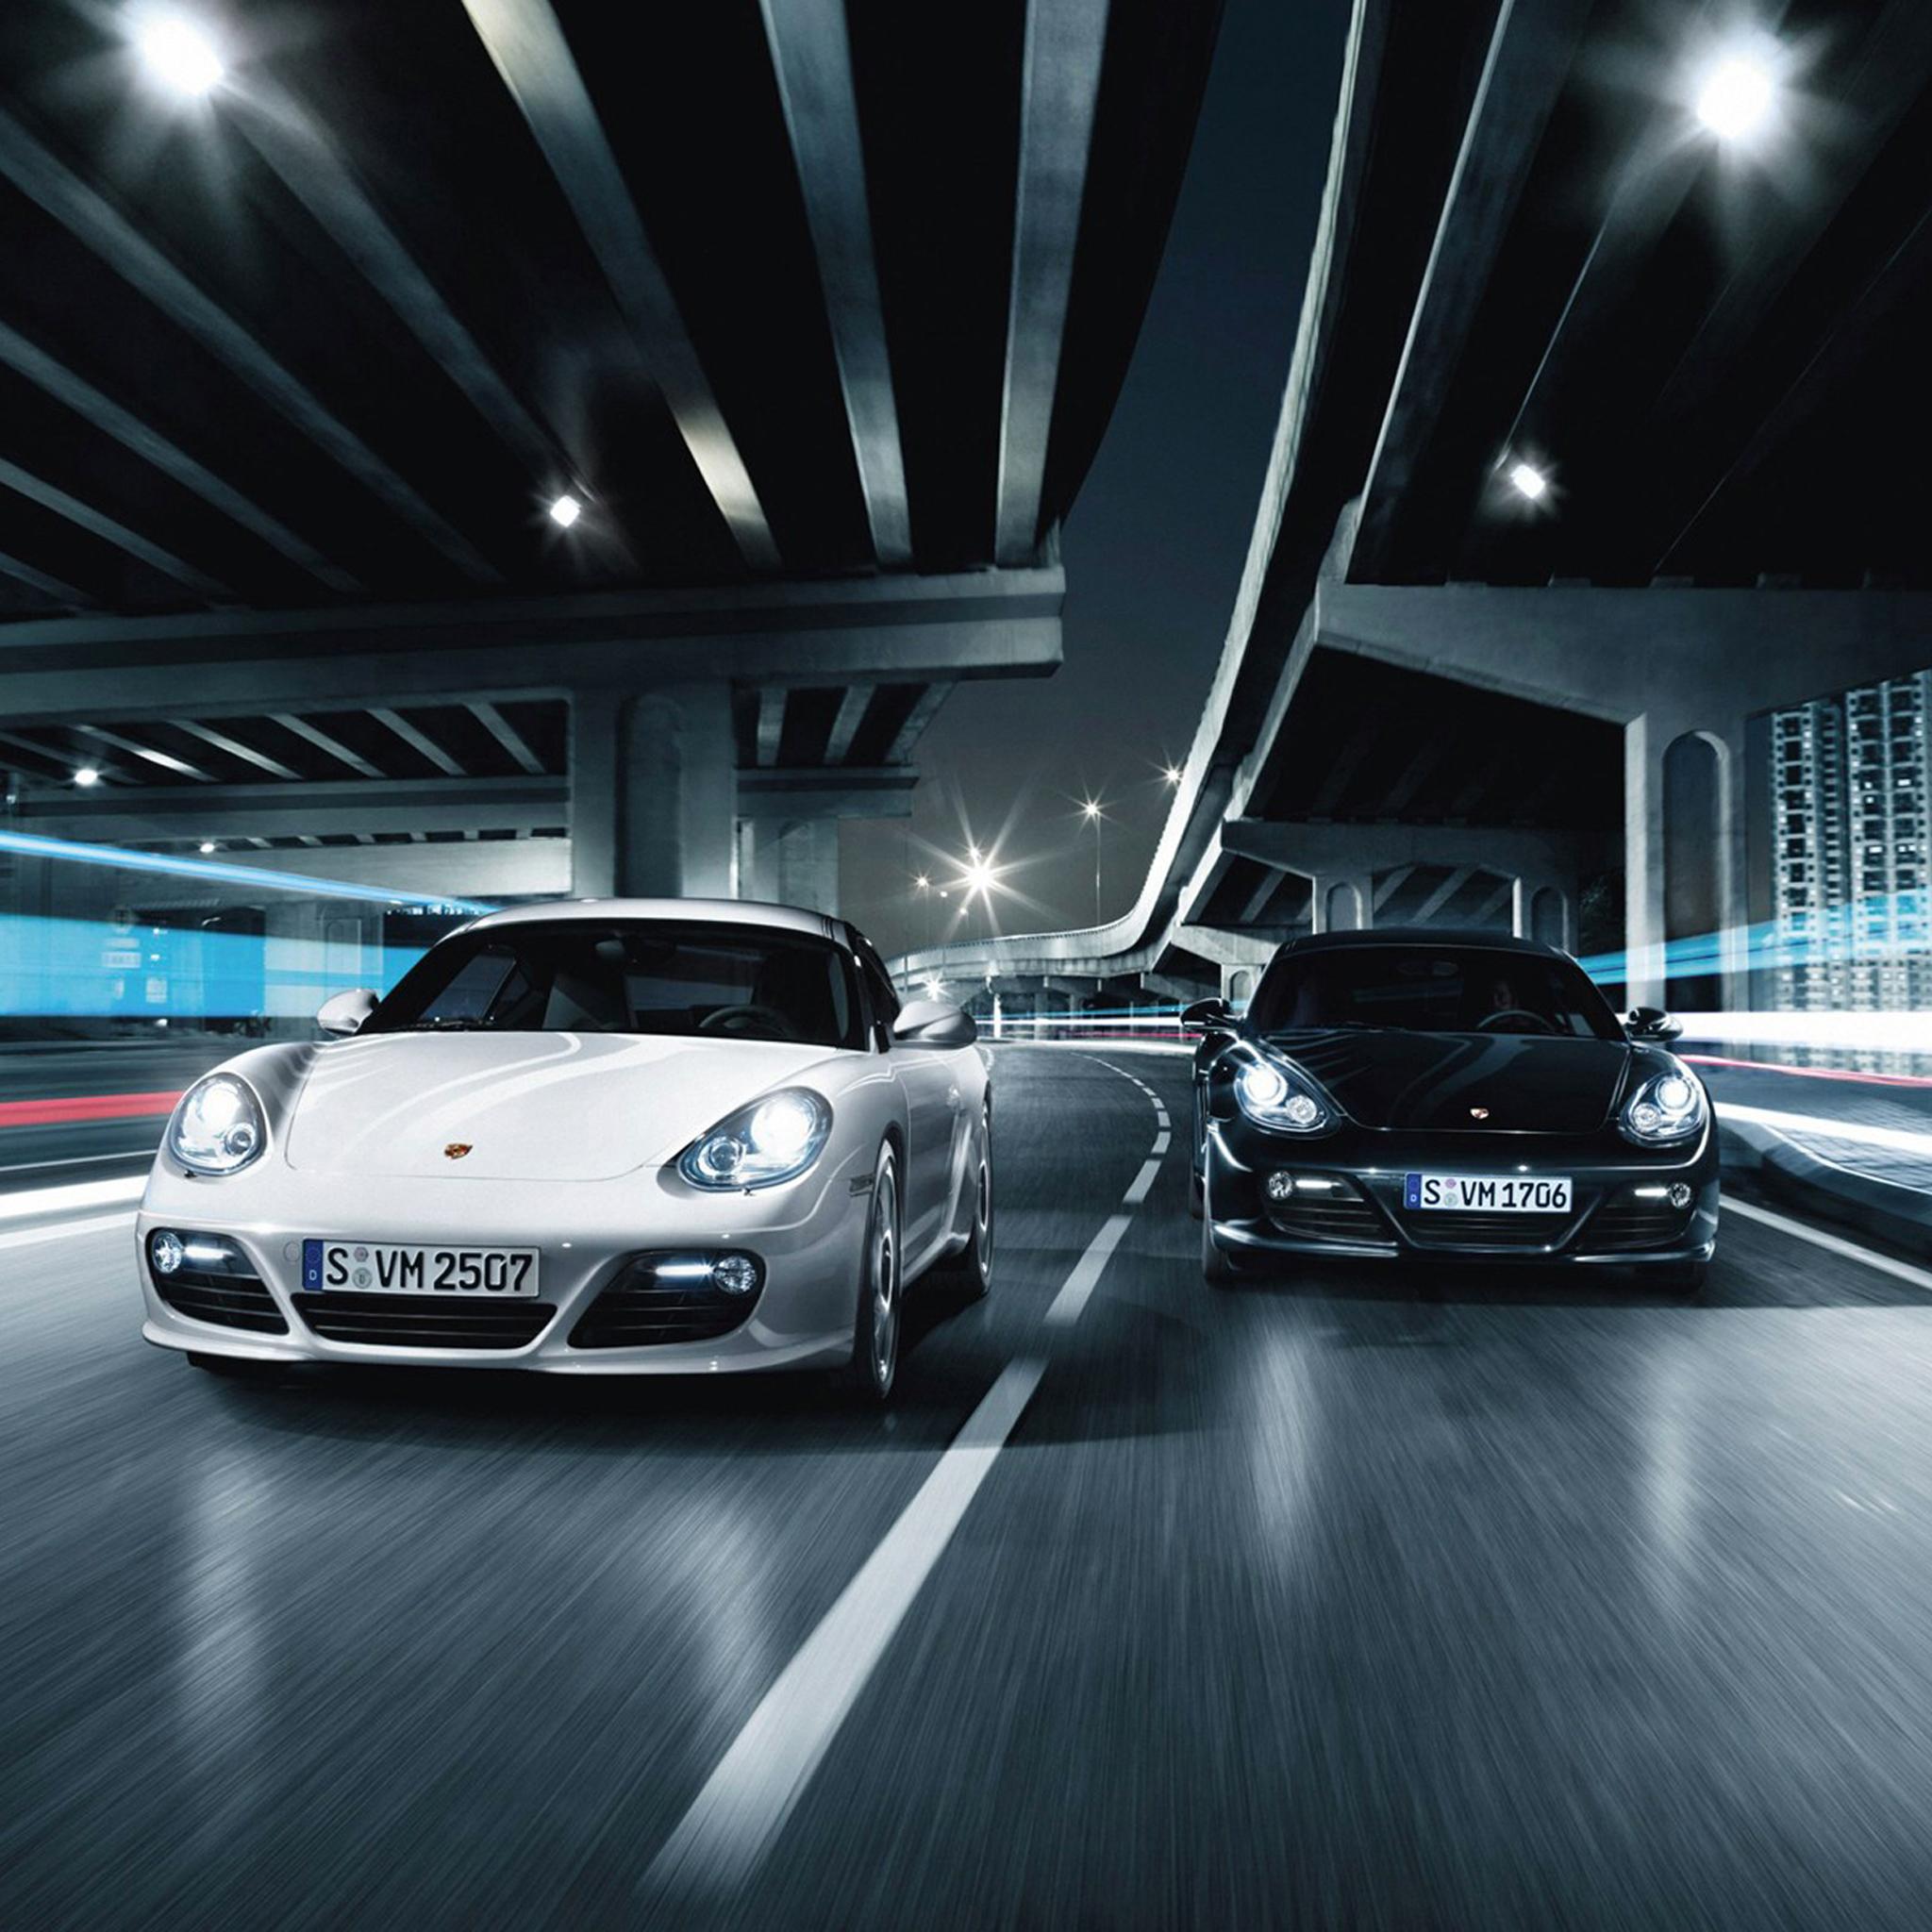 Porsche Cayman 3Wallpapers iPad Retina Porsche Cayman   iPad Retina